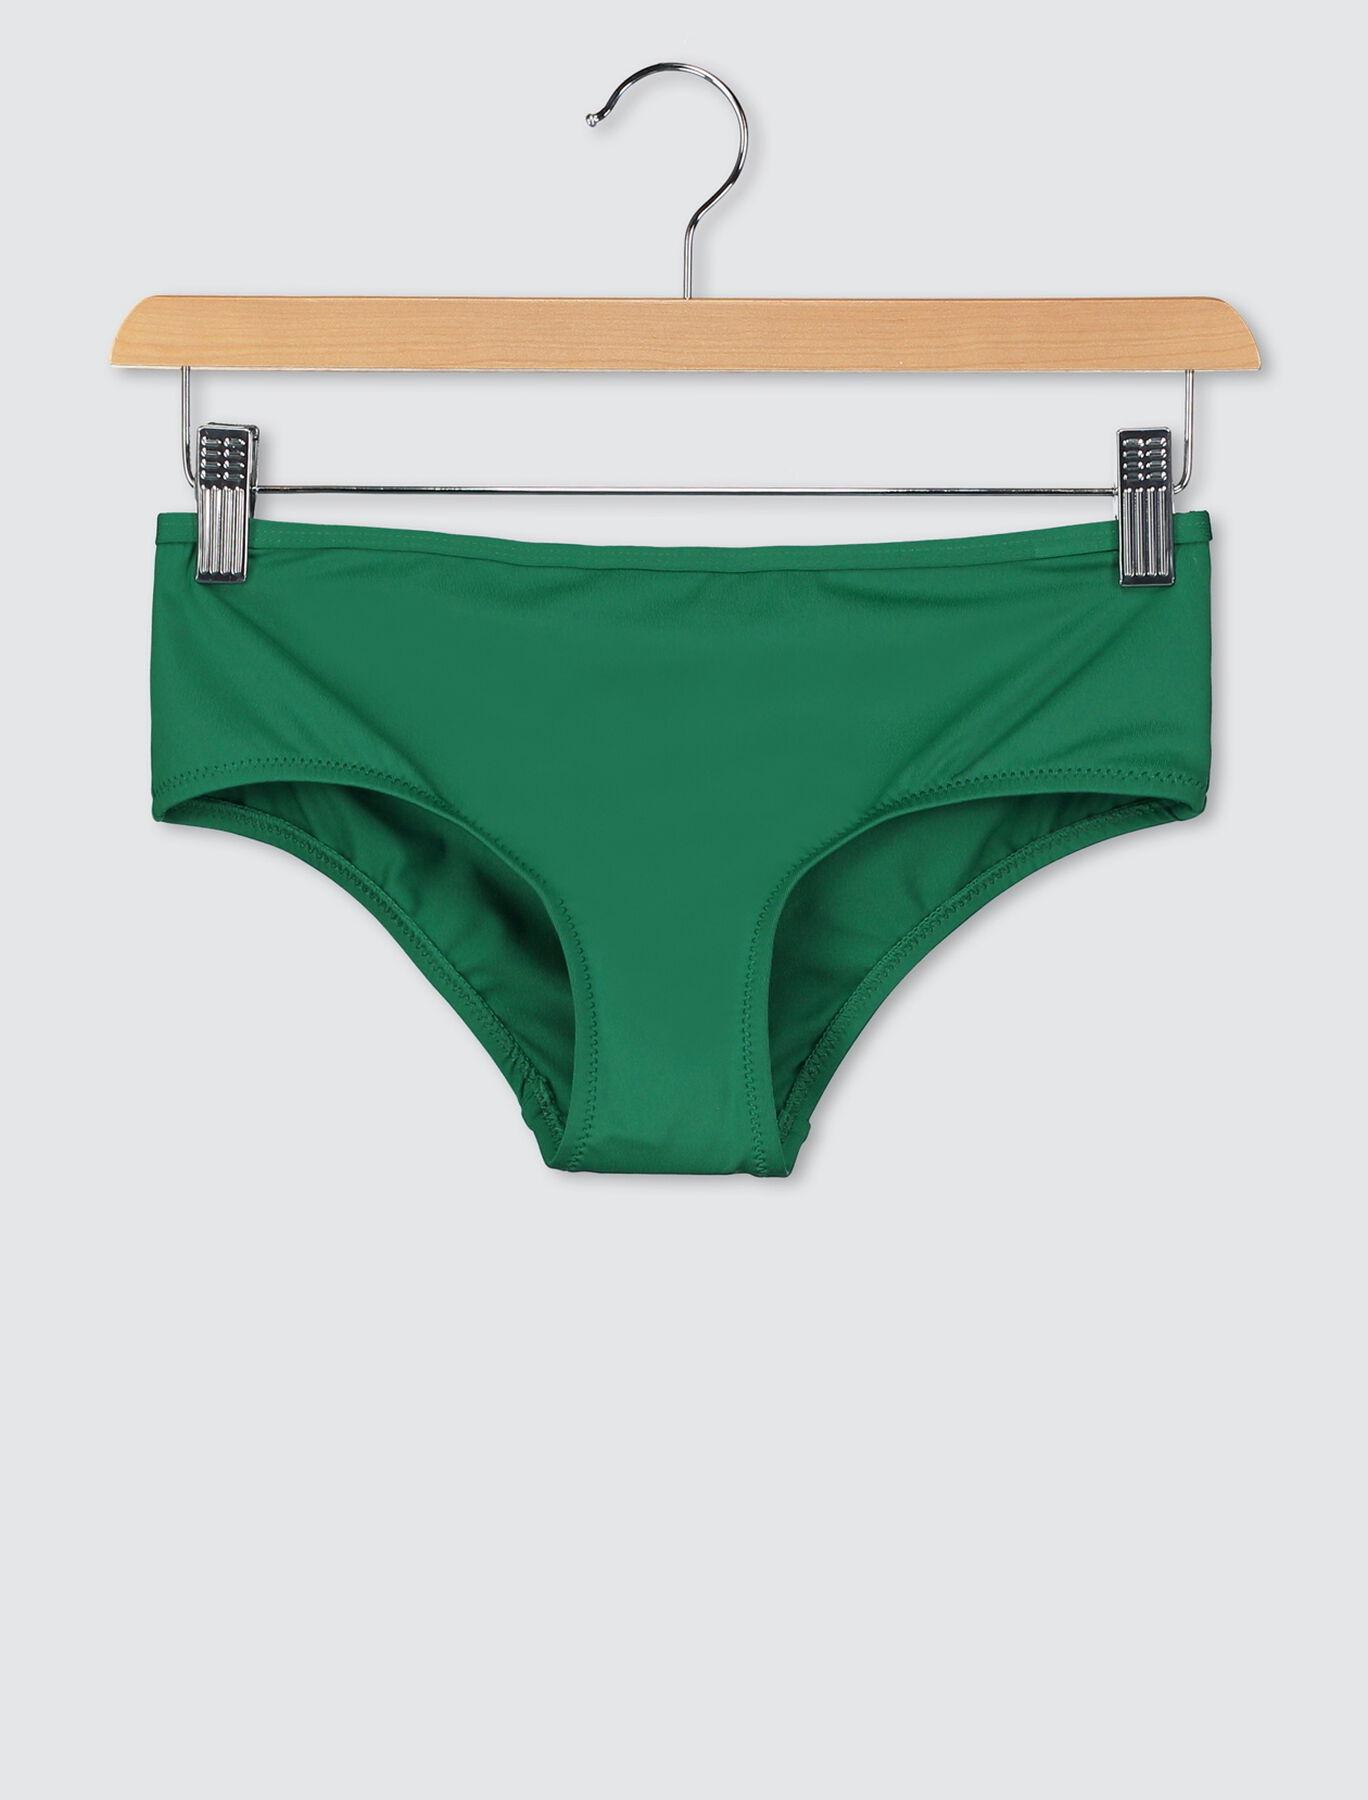 Bas de maillot de bain culotte hipster unie